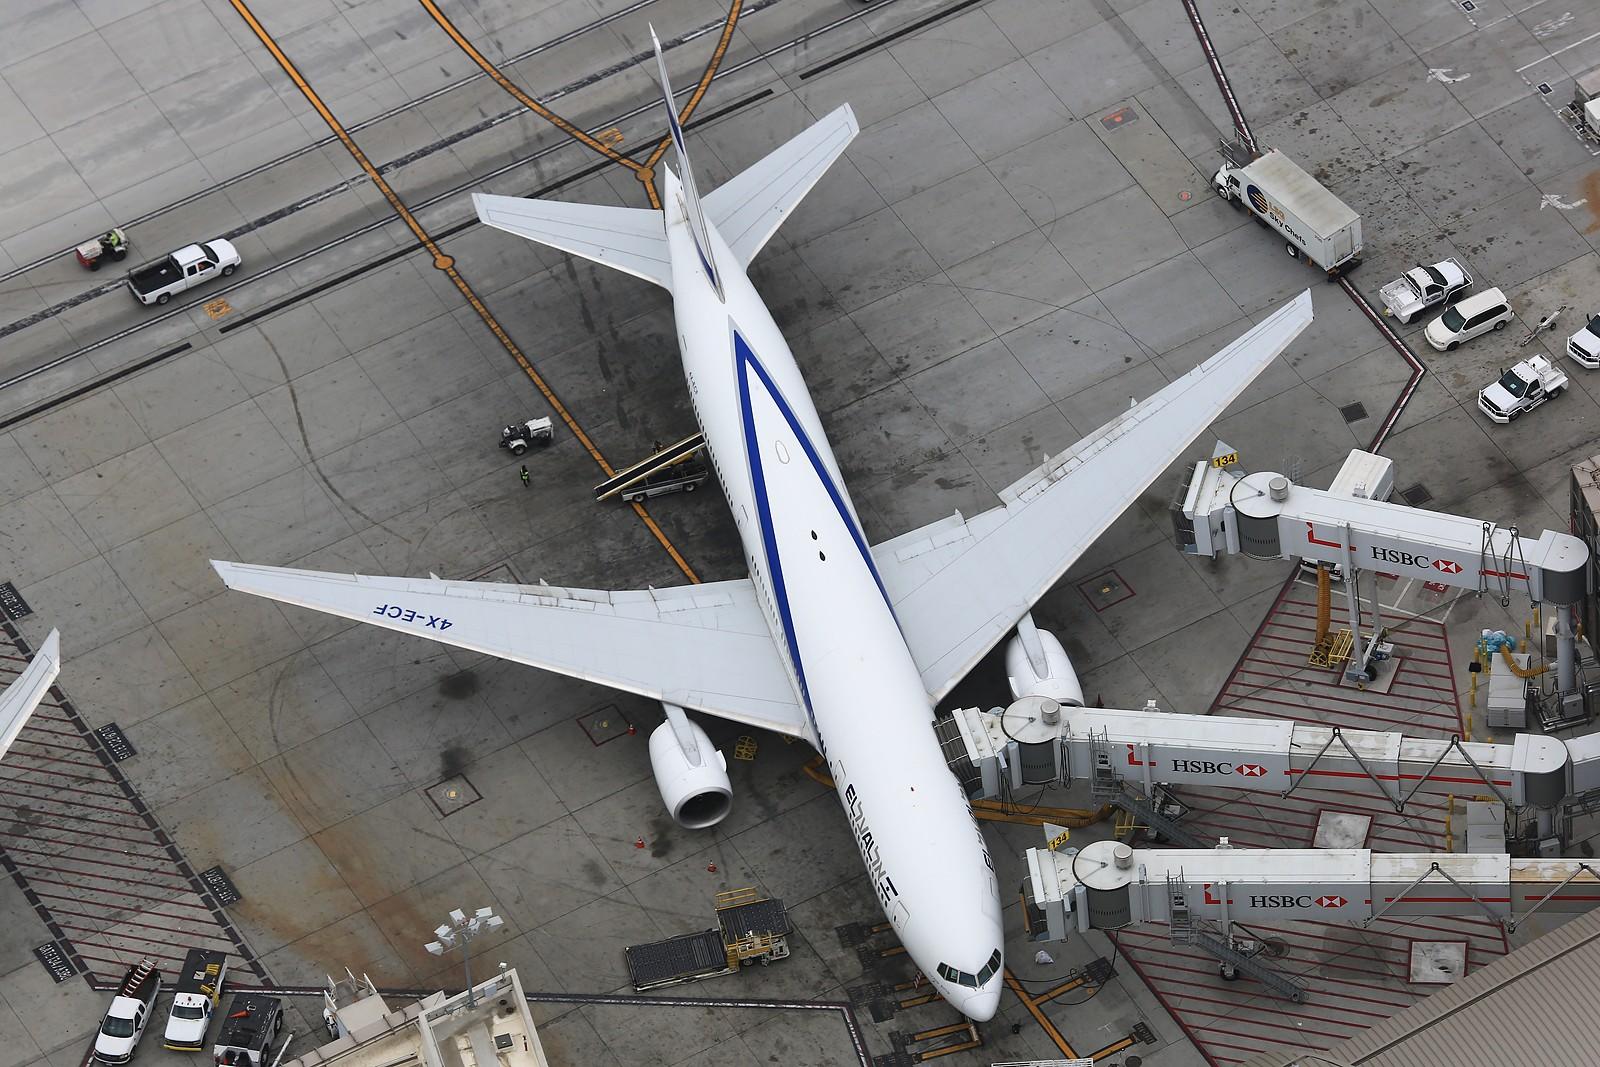 Re:[原创]【LAX】**********777级了,空对空&空对地部分777合集[1600*1067]********** BOEING 777-200ER 4X-ECF 美国洛杉矶机场